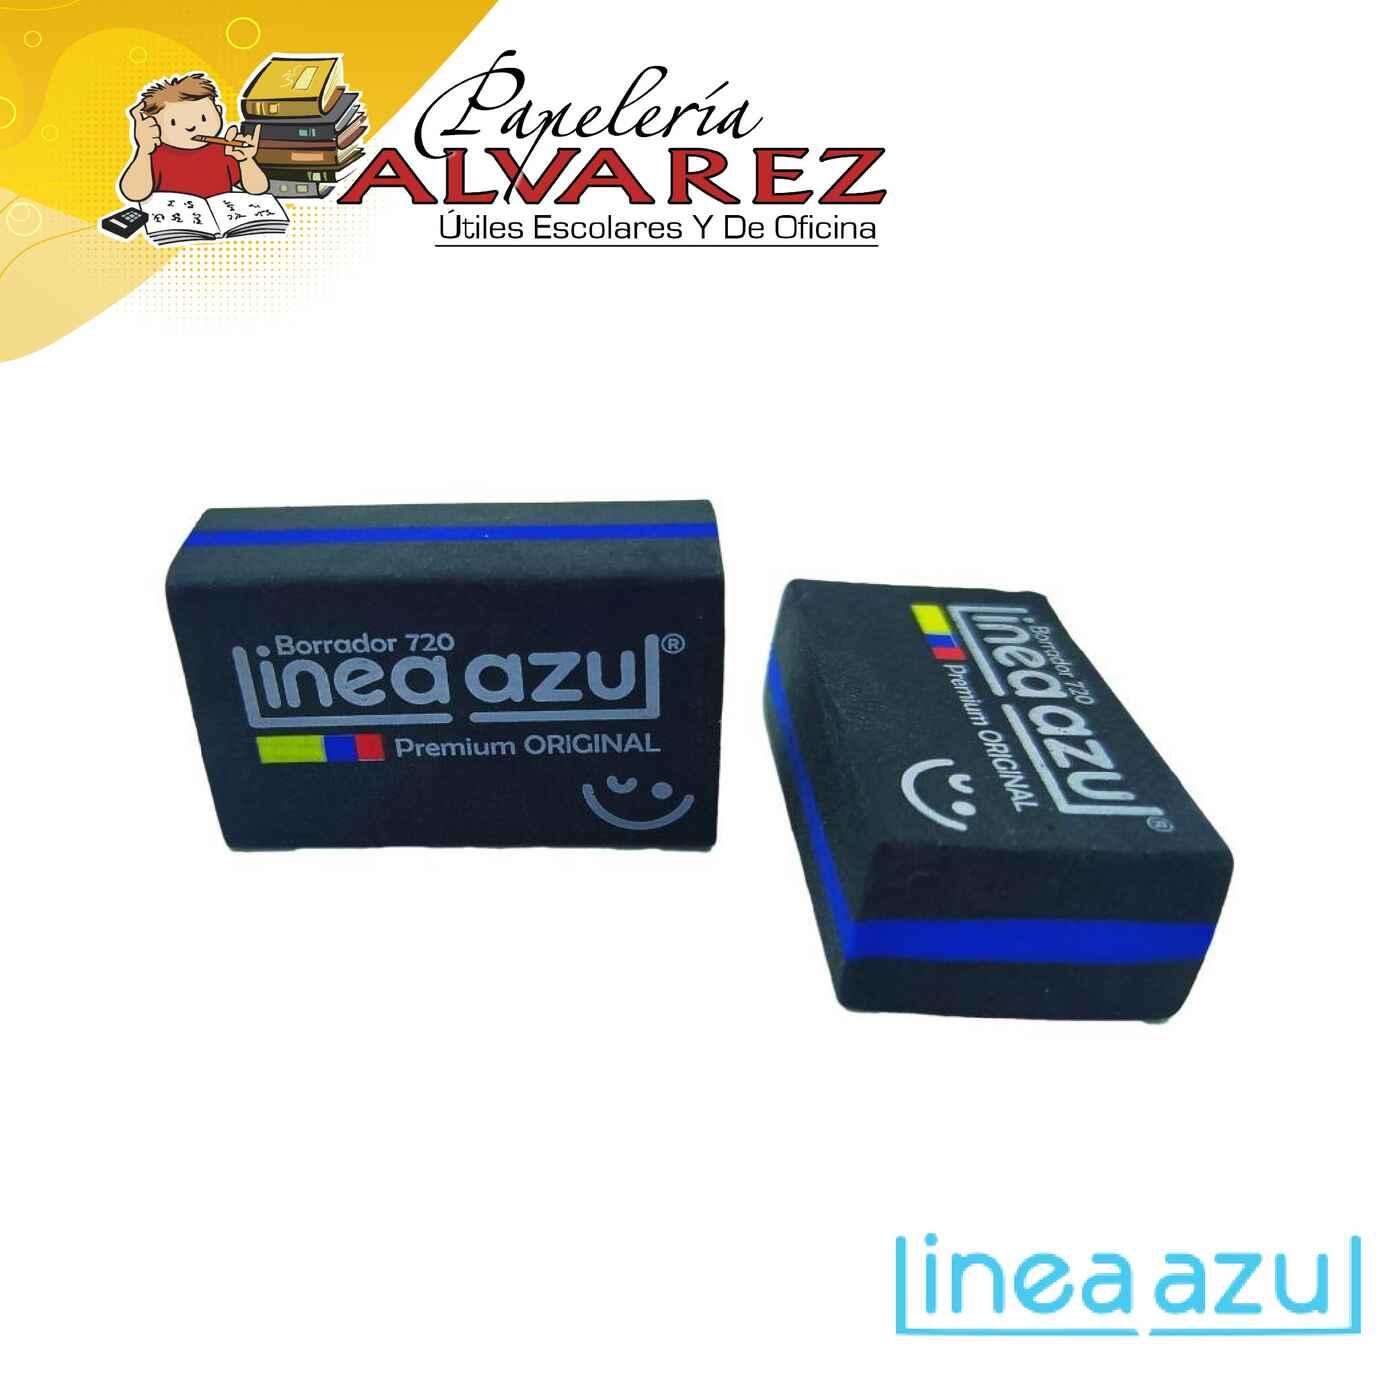 BORRADOR LINEA AZUL PREMIUM NEGRO 720